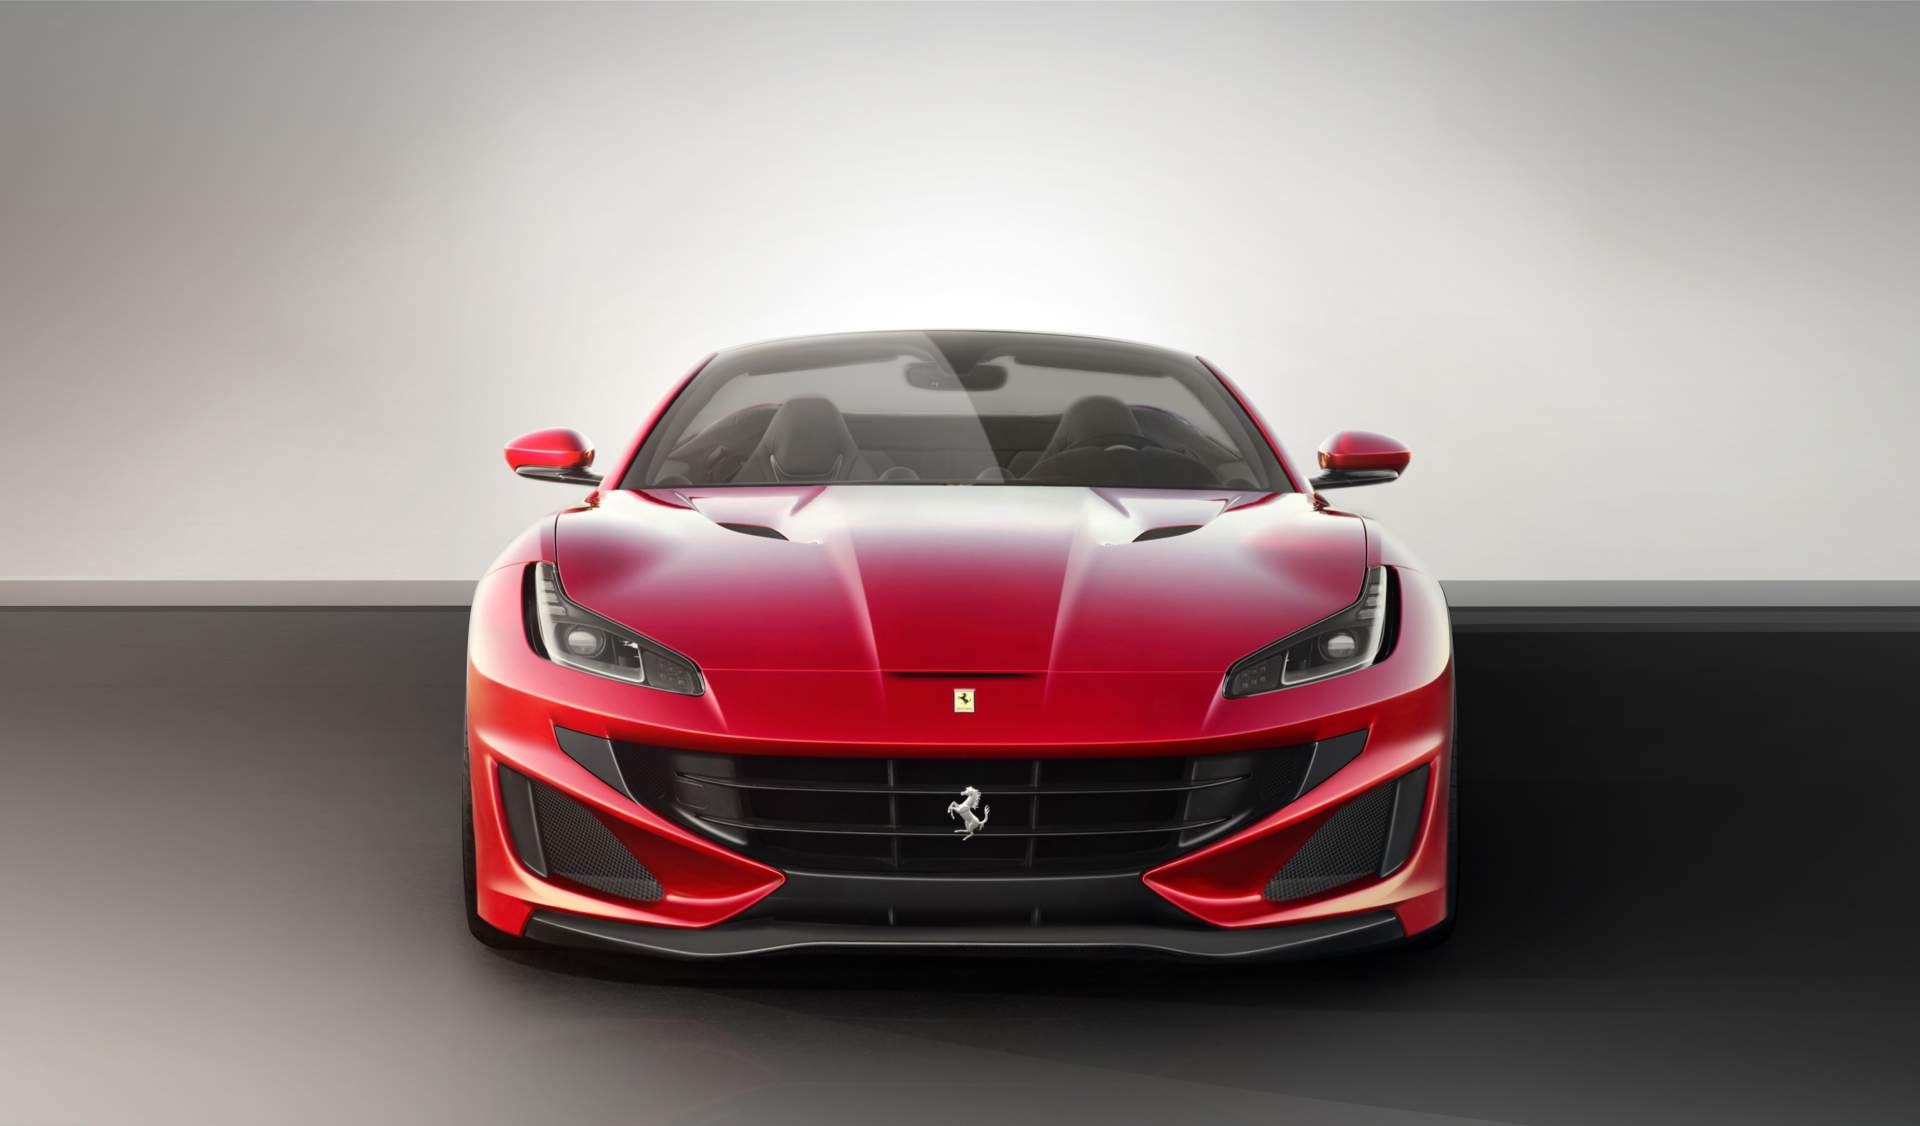 Ferrari Portofino Lp 740 2 0 By Loma Namastecar